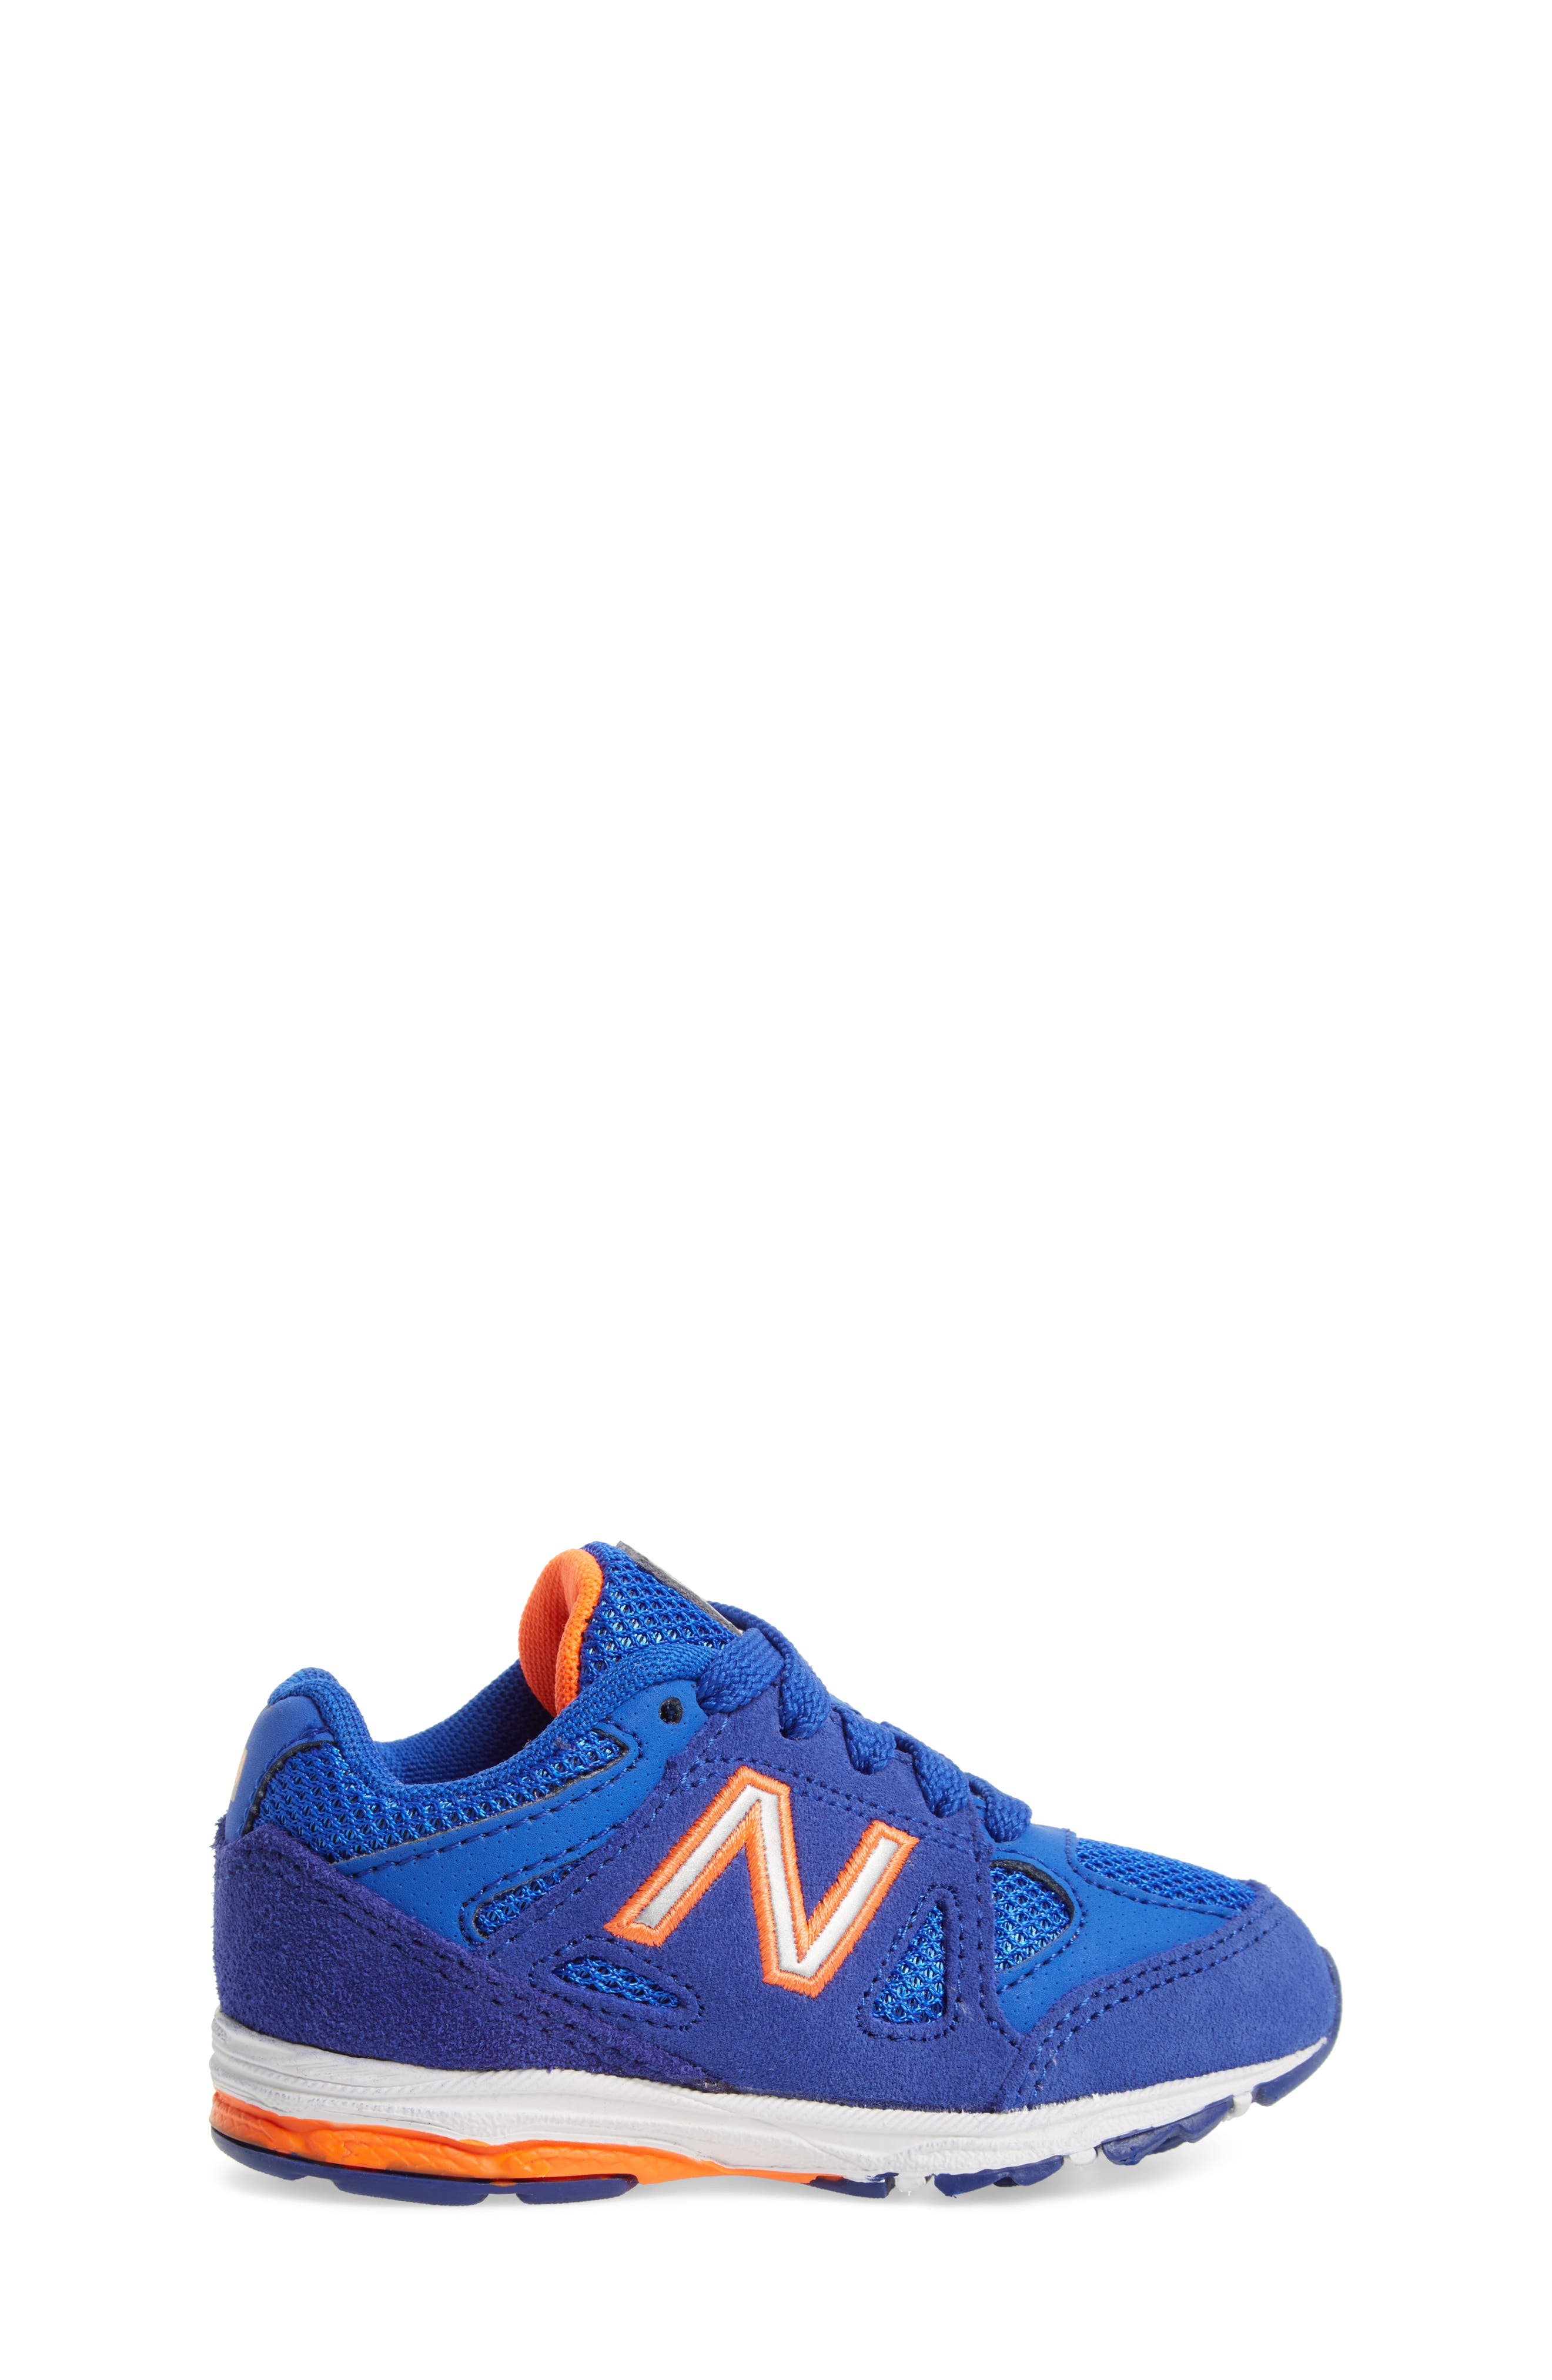 888 Sneaker,                             Alternate thumbnail 3, color,                             Pacific